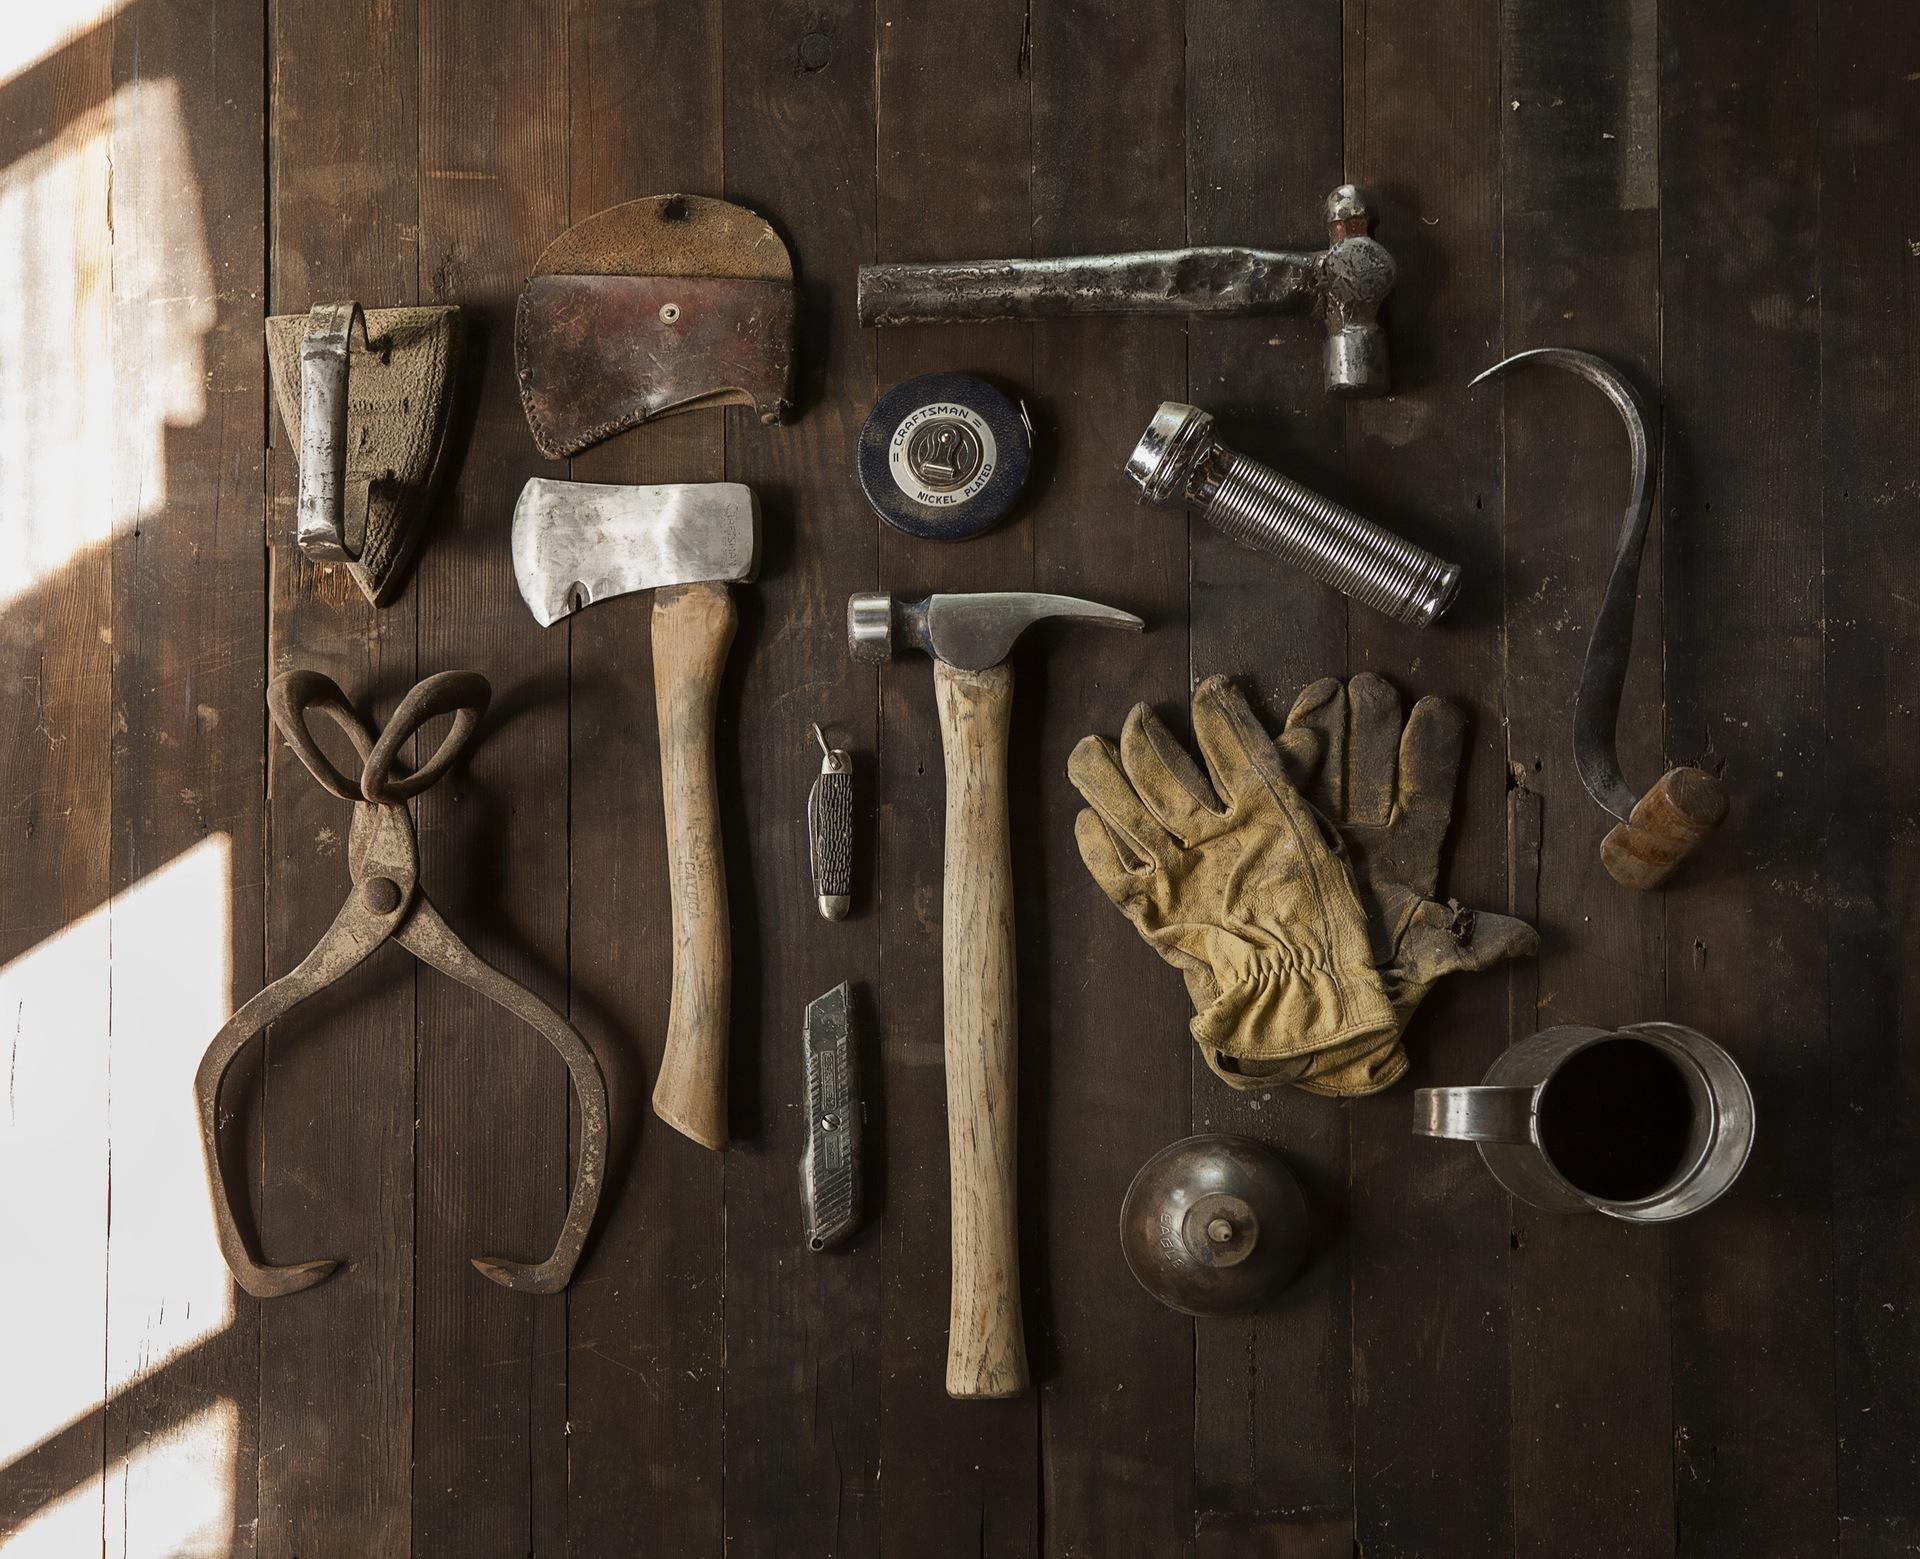 Construction work carpenter tools